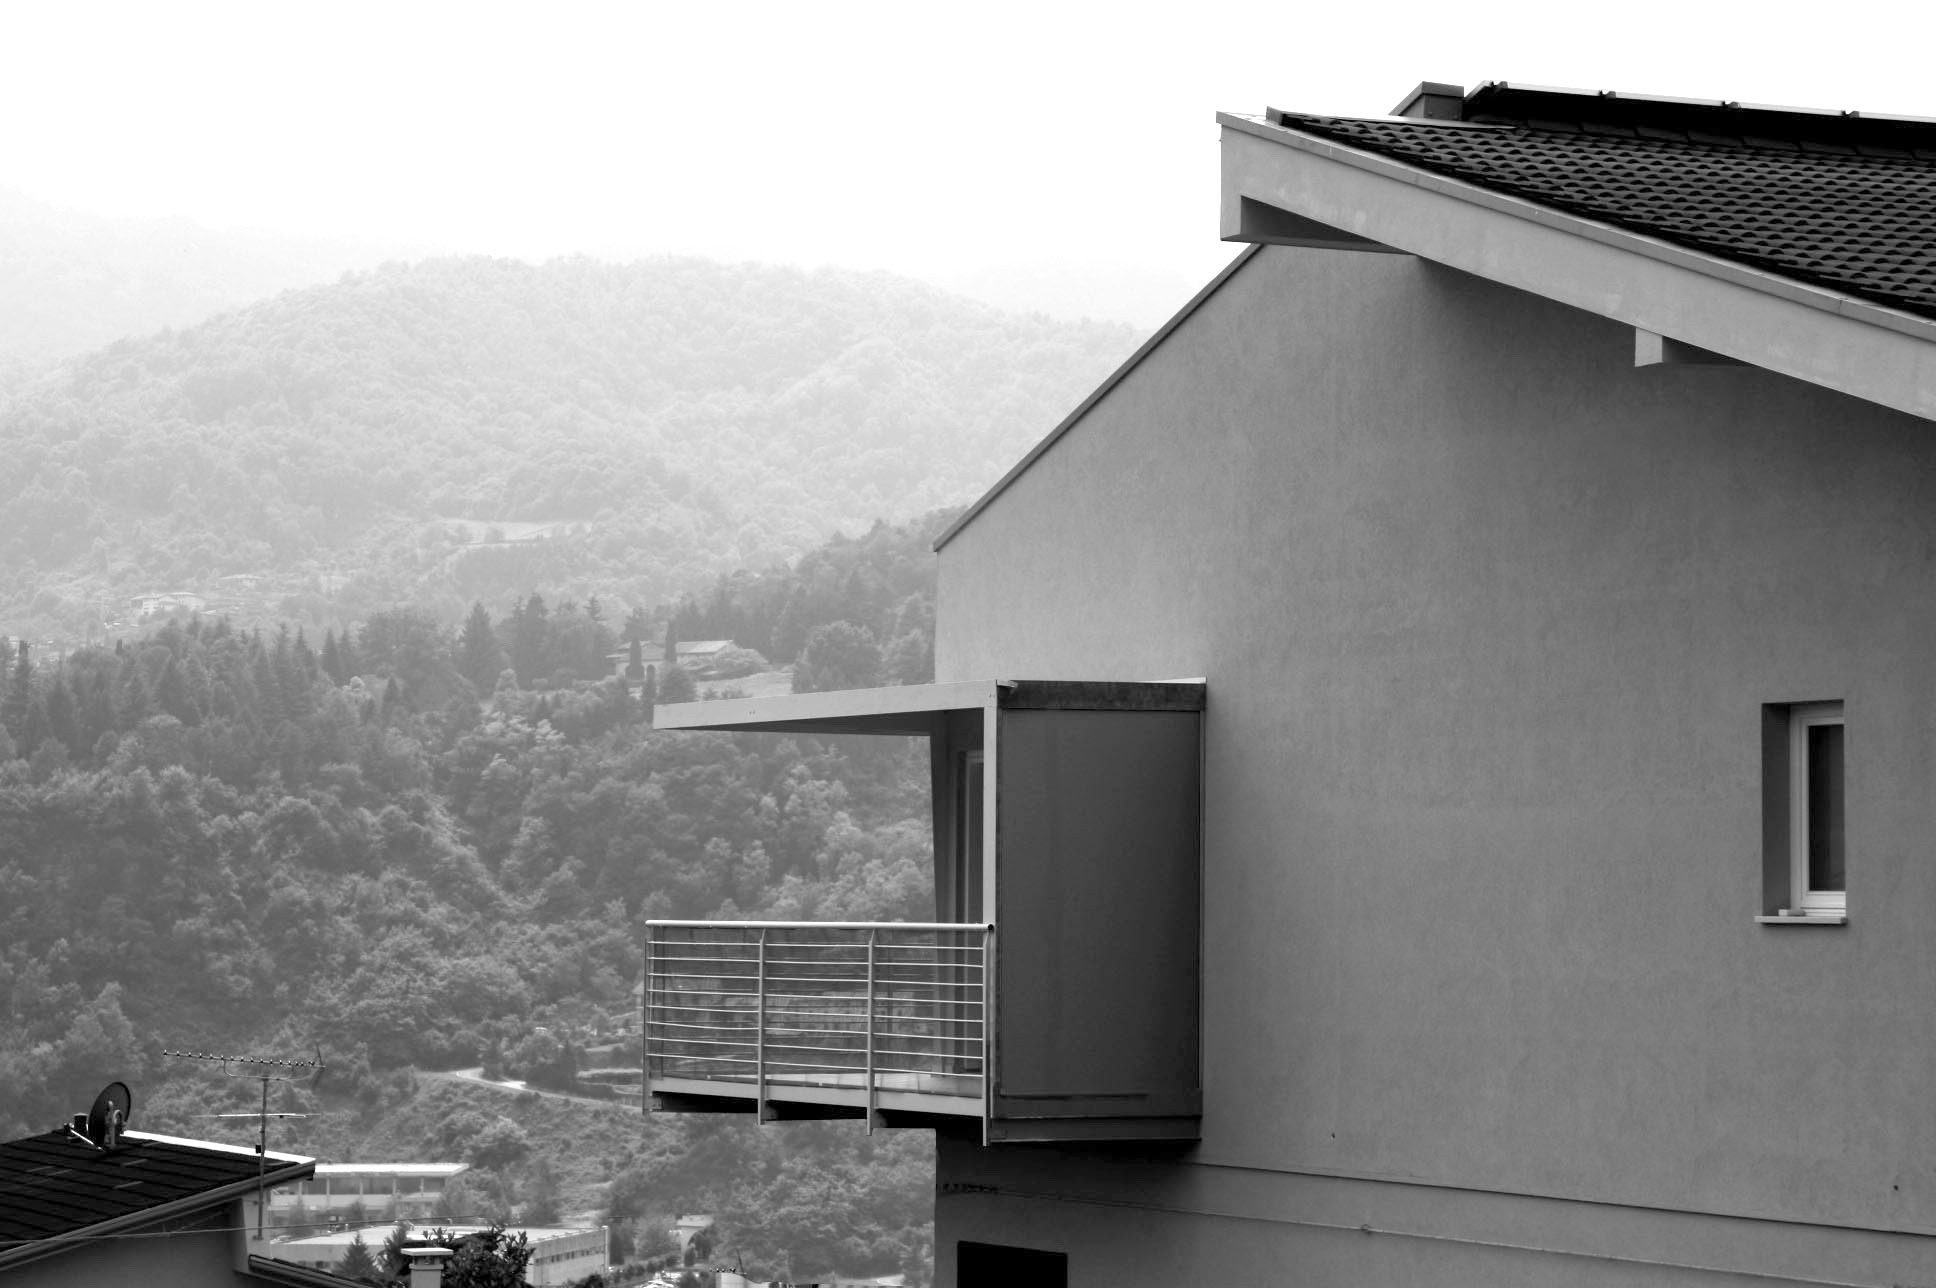 nicolaferiottistudio_casa_h2o-03